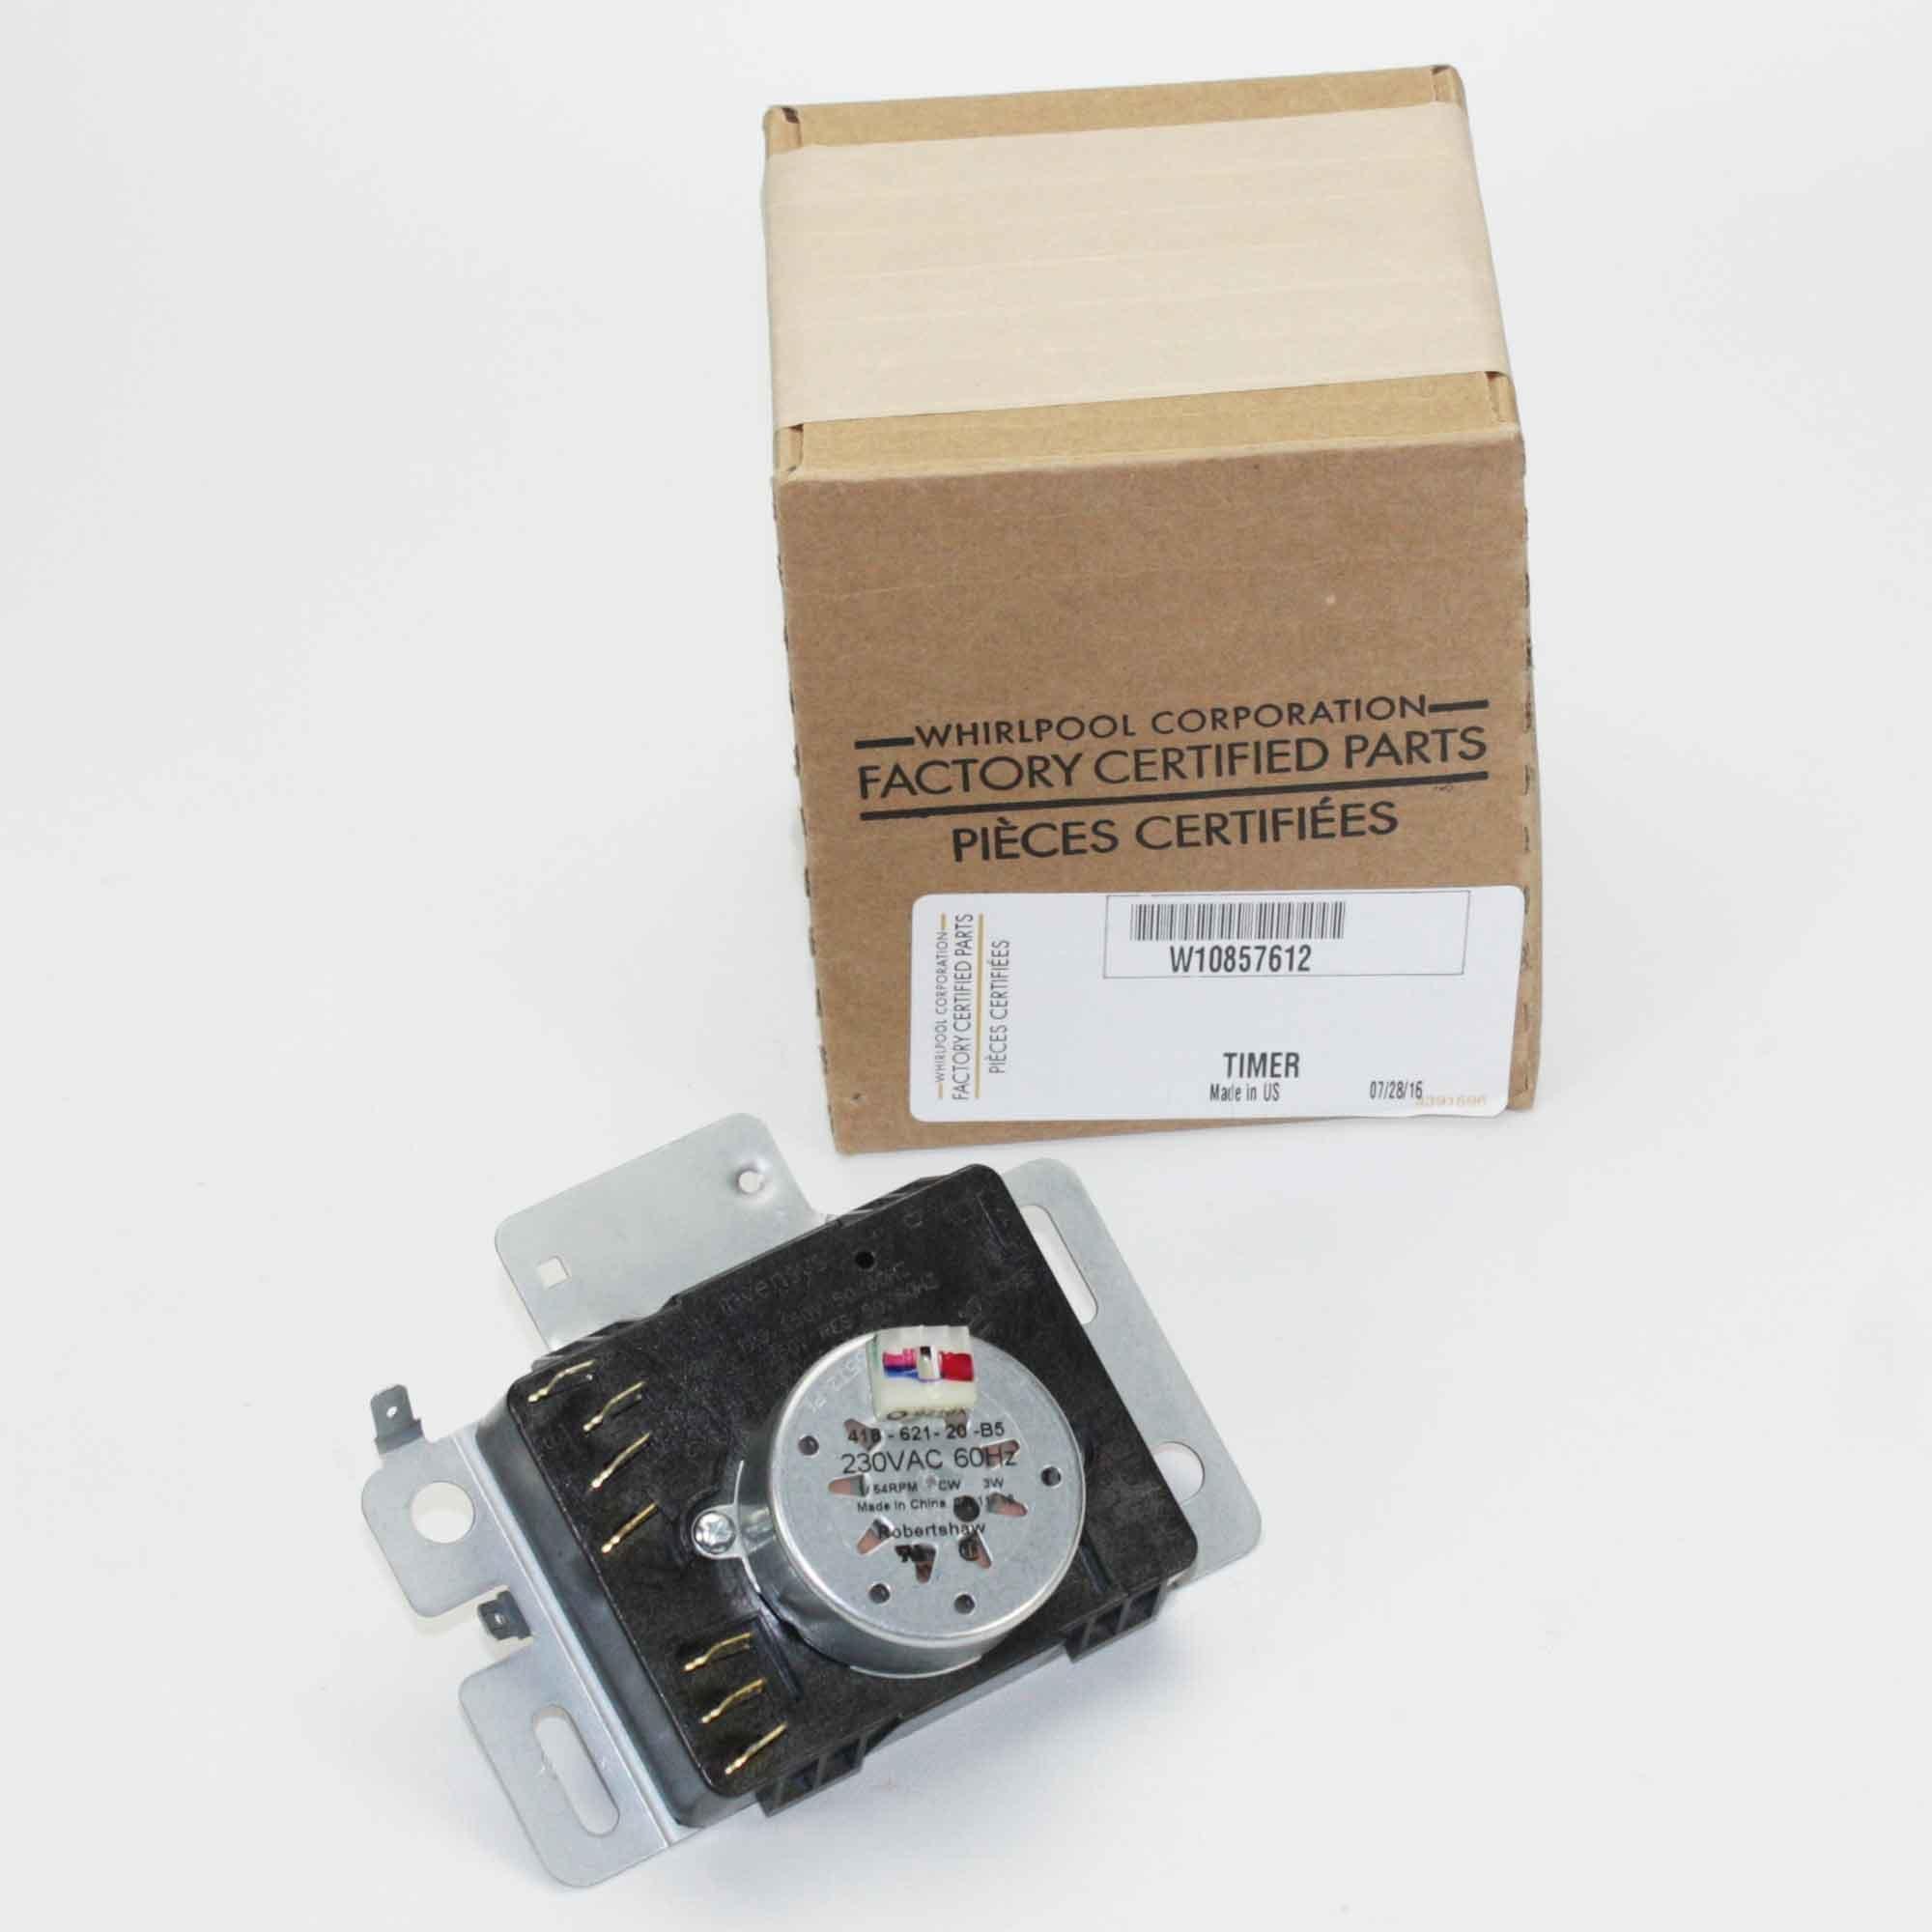 Whirlpool W10857612 Dryer Timer, Small, Black